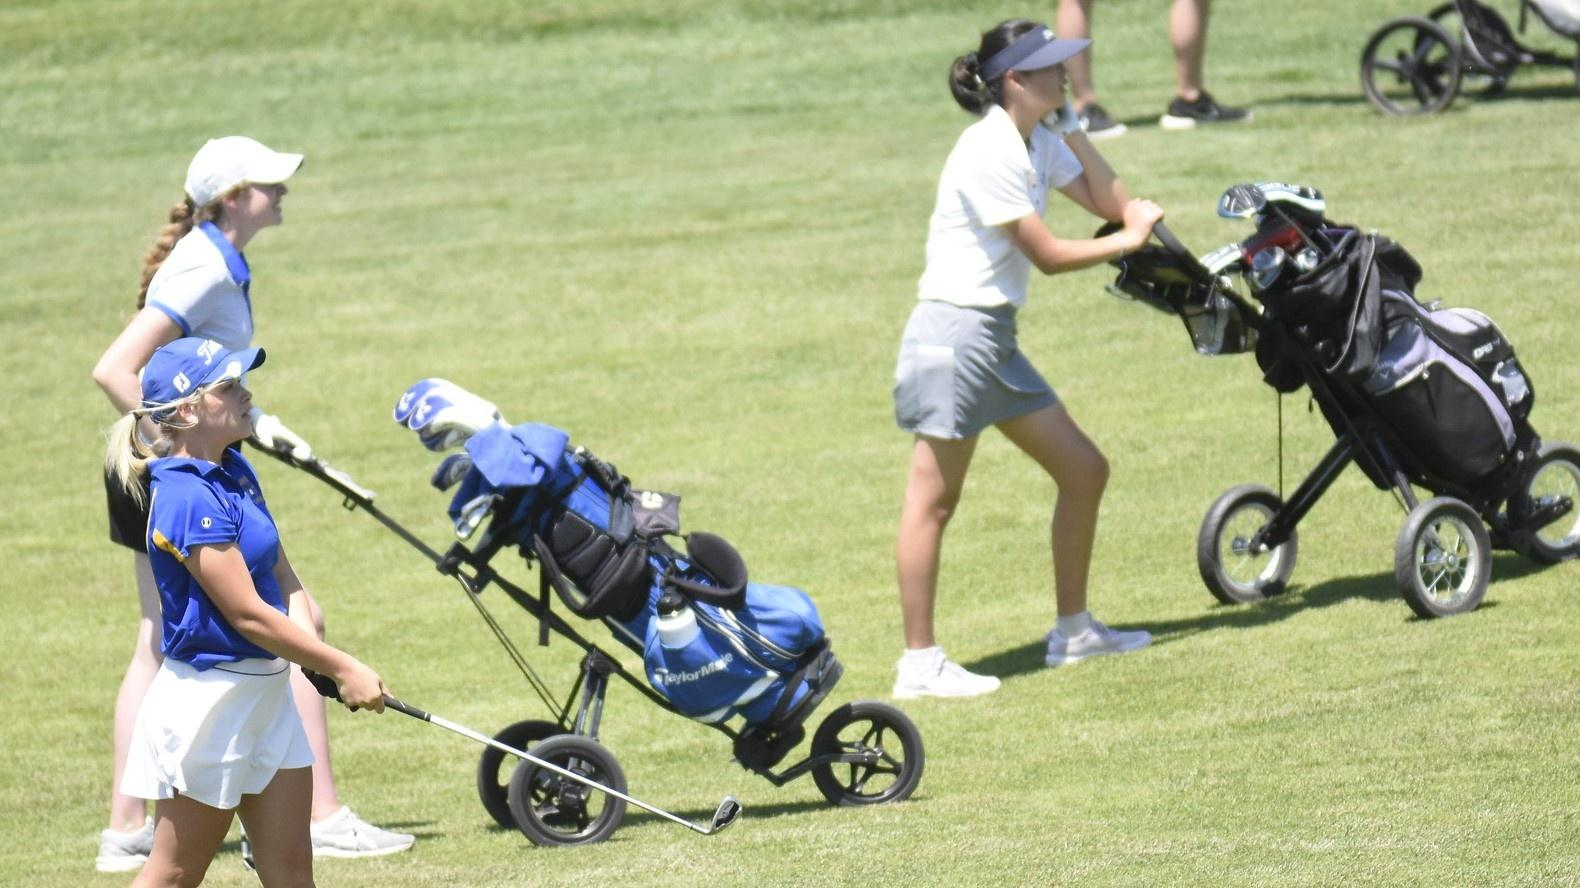 SDPB HS A Girls Golf Results Link